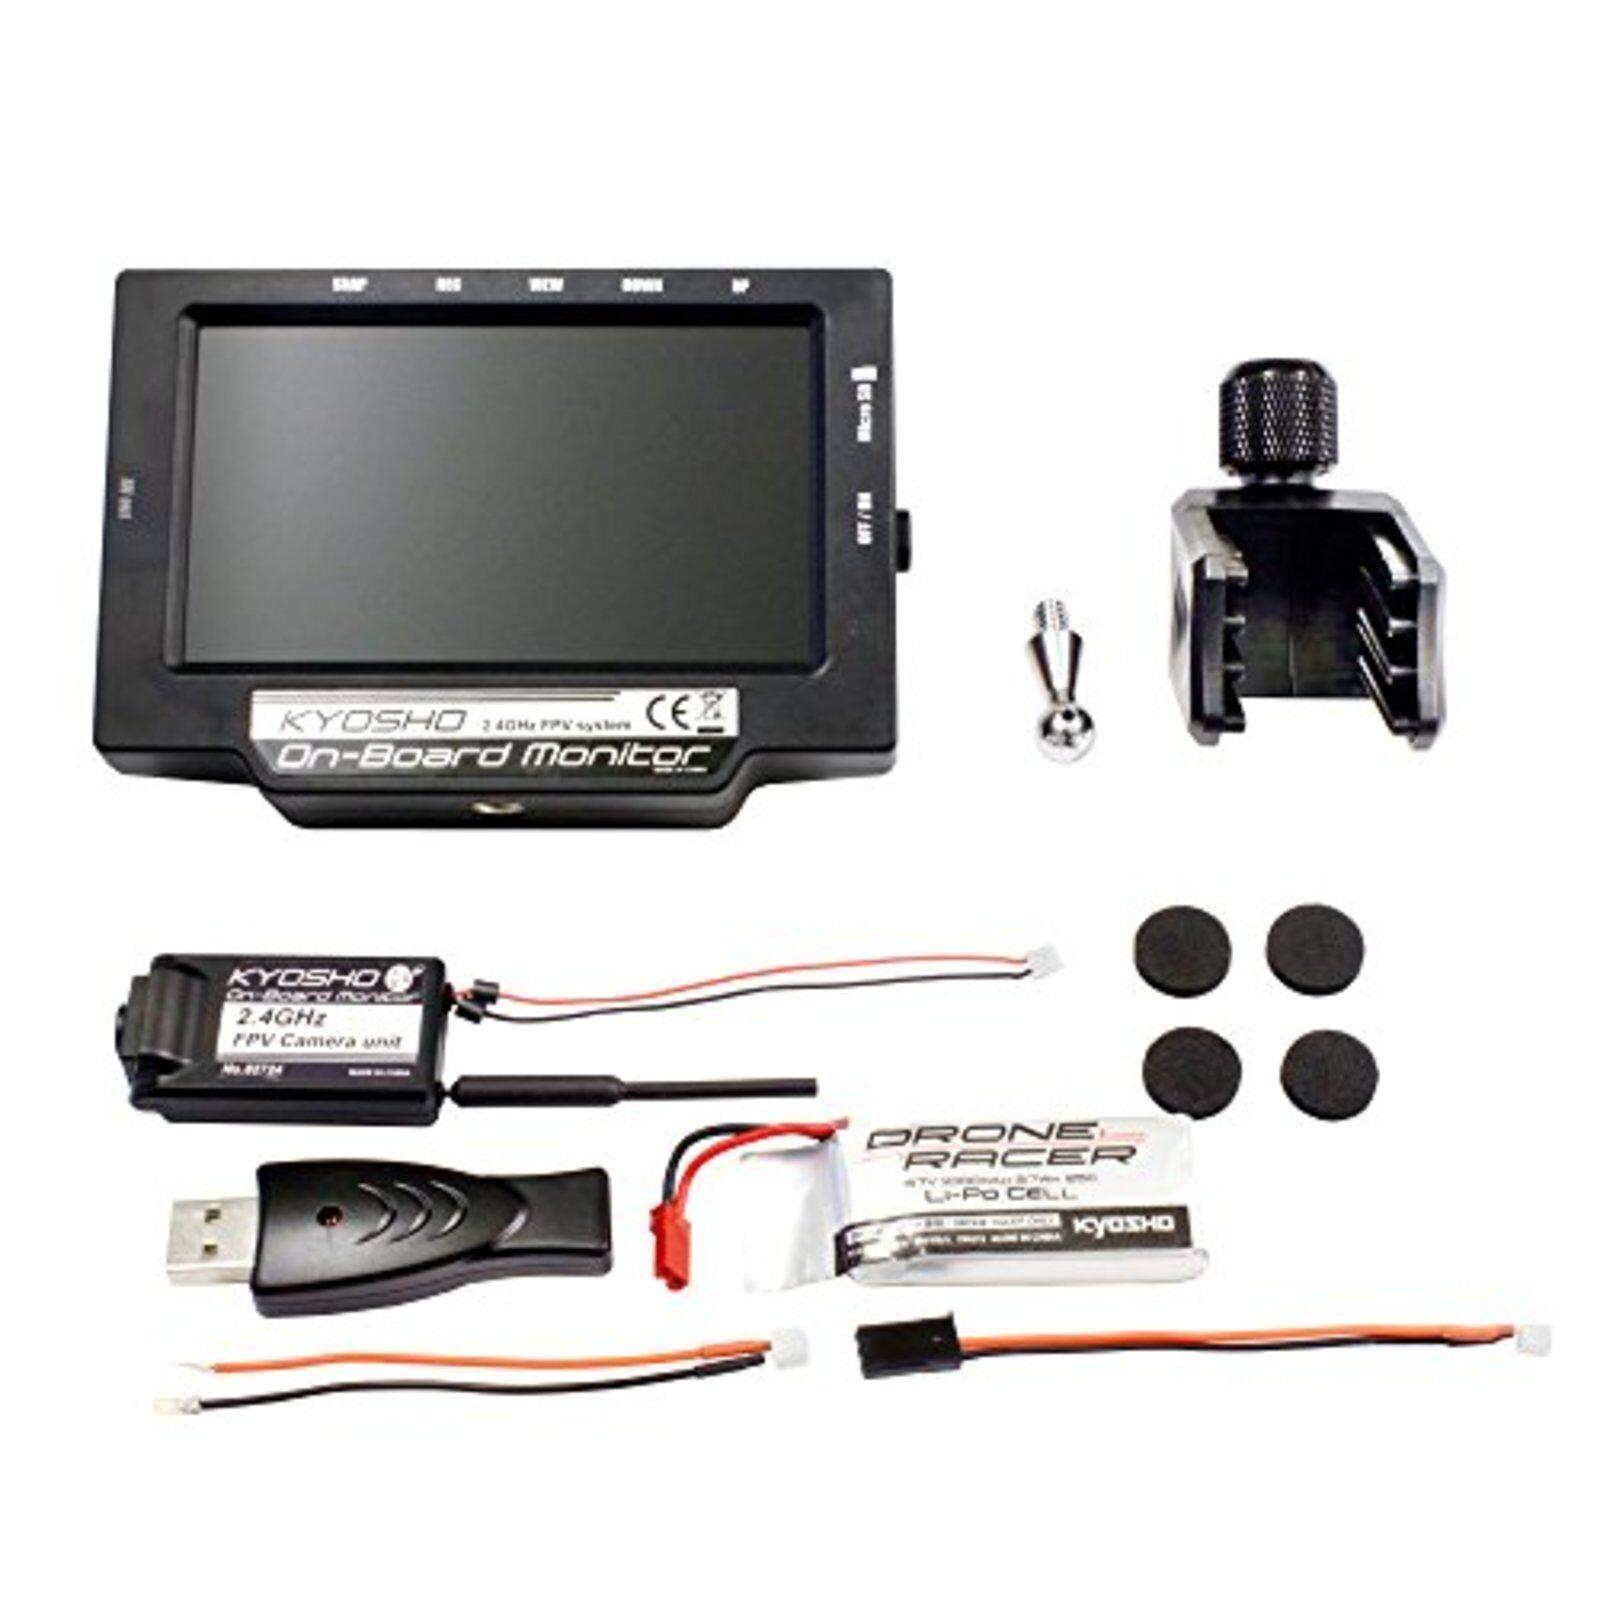 Kyosho a Bordo Monitor Batería & Cargador USB Radiocontrol FPV Sistema 82724bc